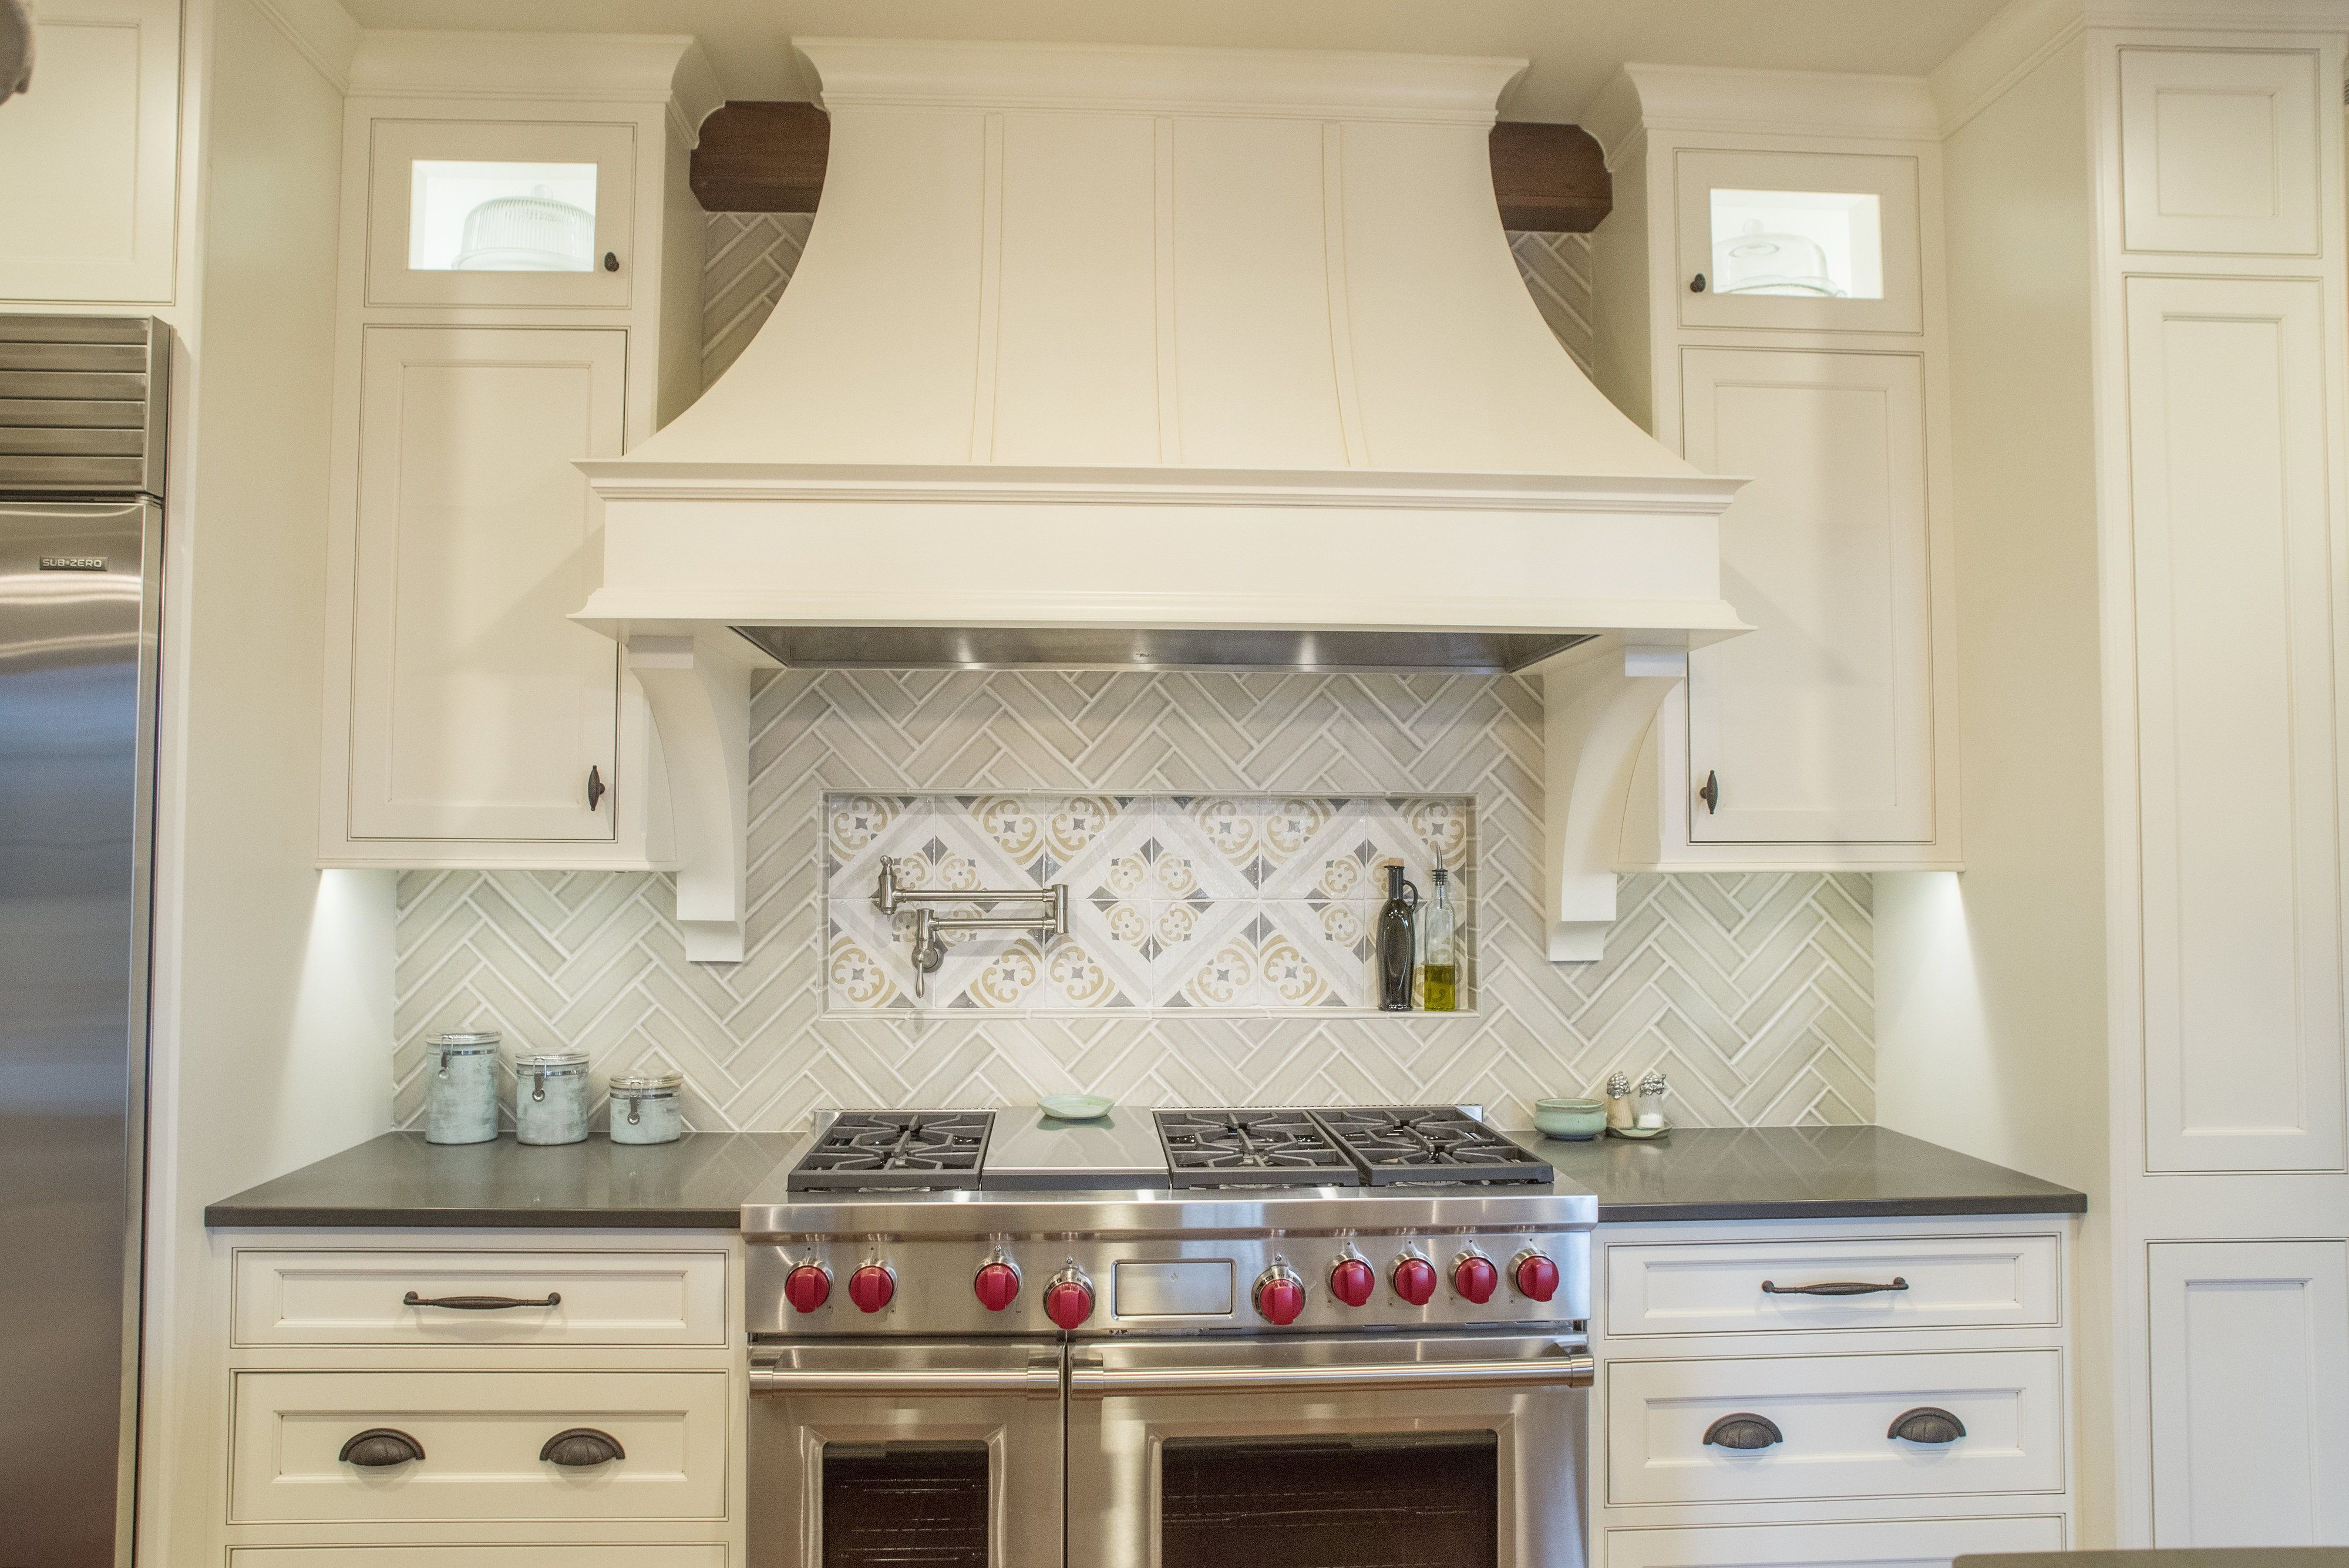 Crystal Cabinets Custom Kitchen Cabinets Kitchen Remodel Small Kitchen Redo